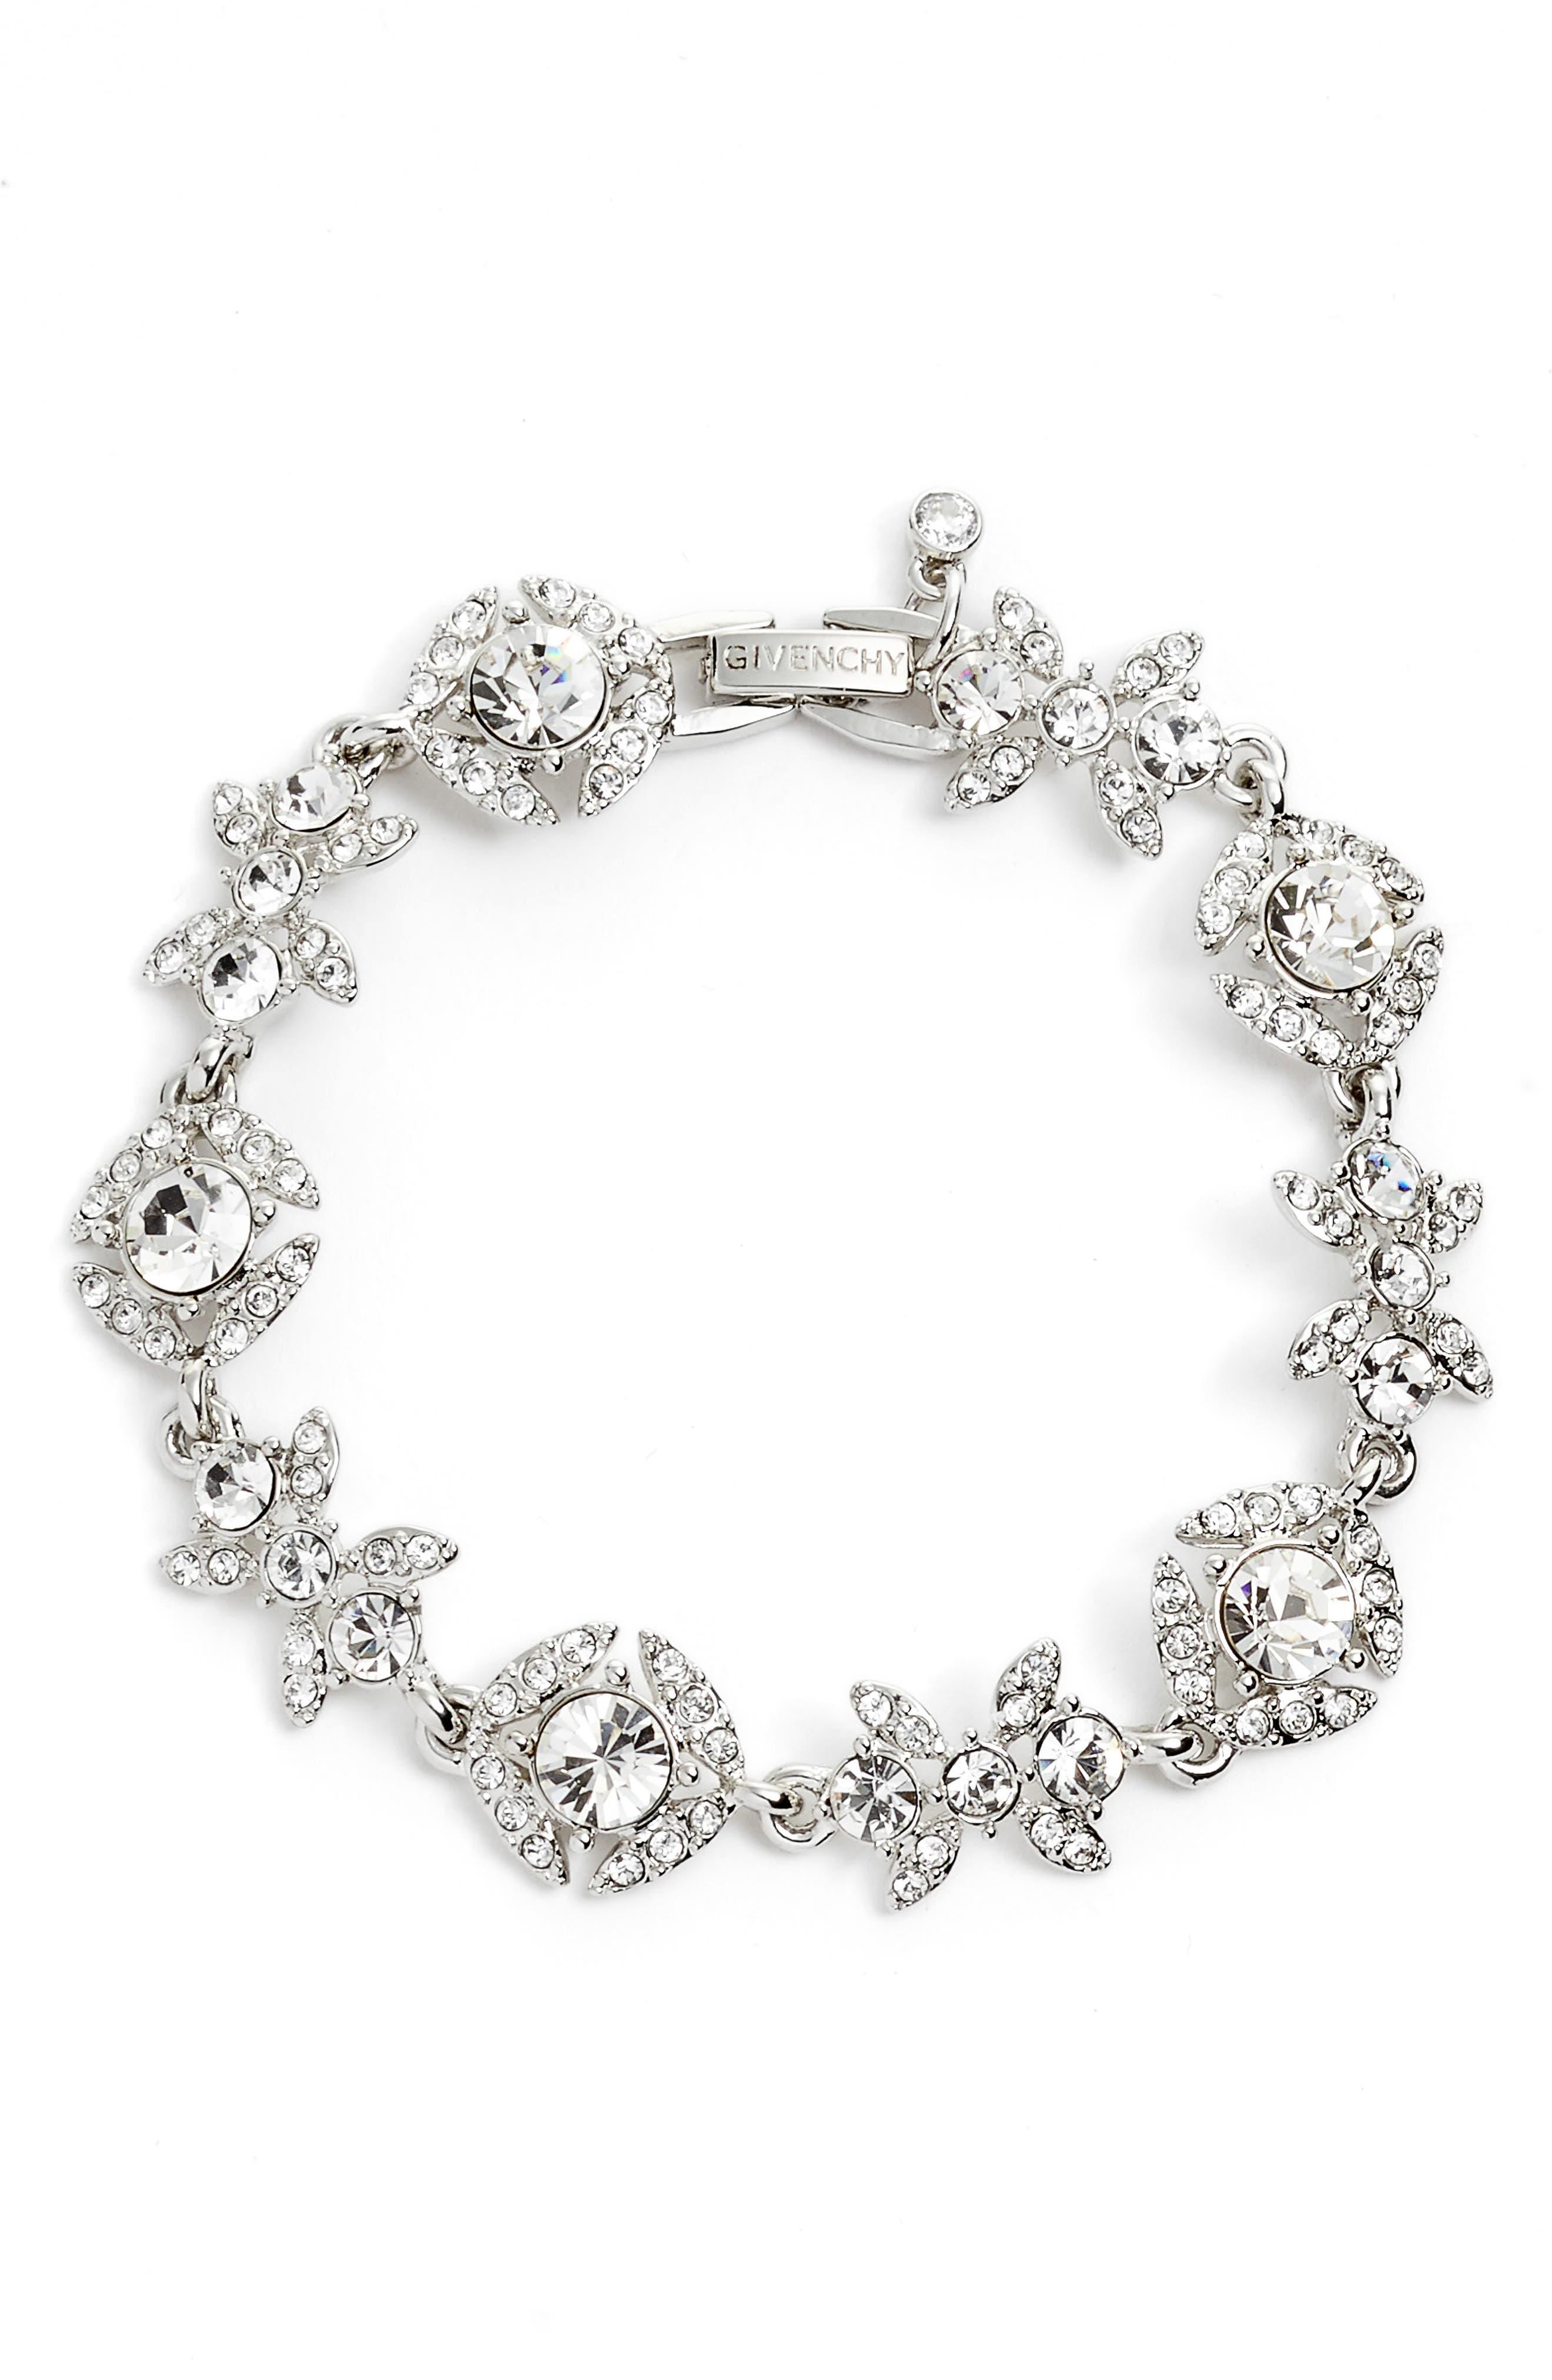 Main Image - Givenchy Crystal Bracelet